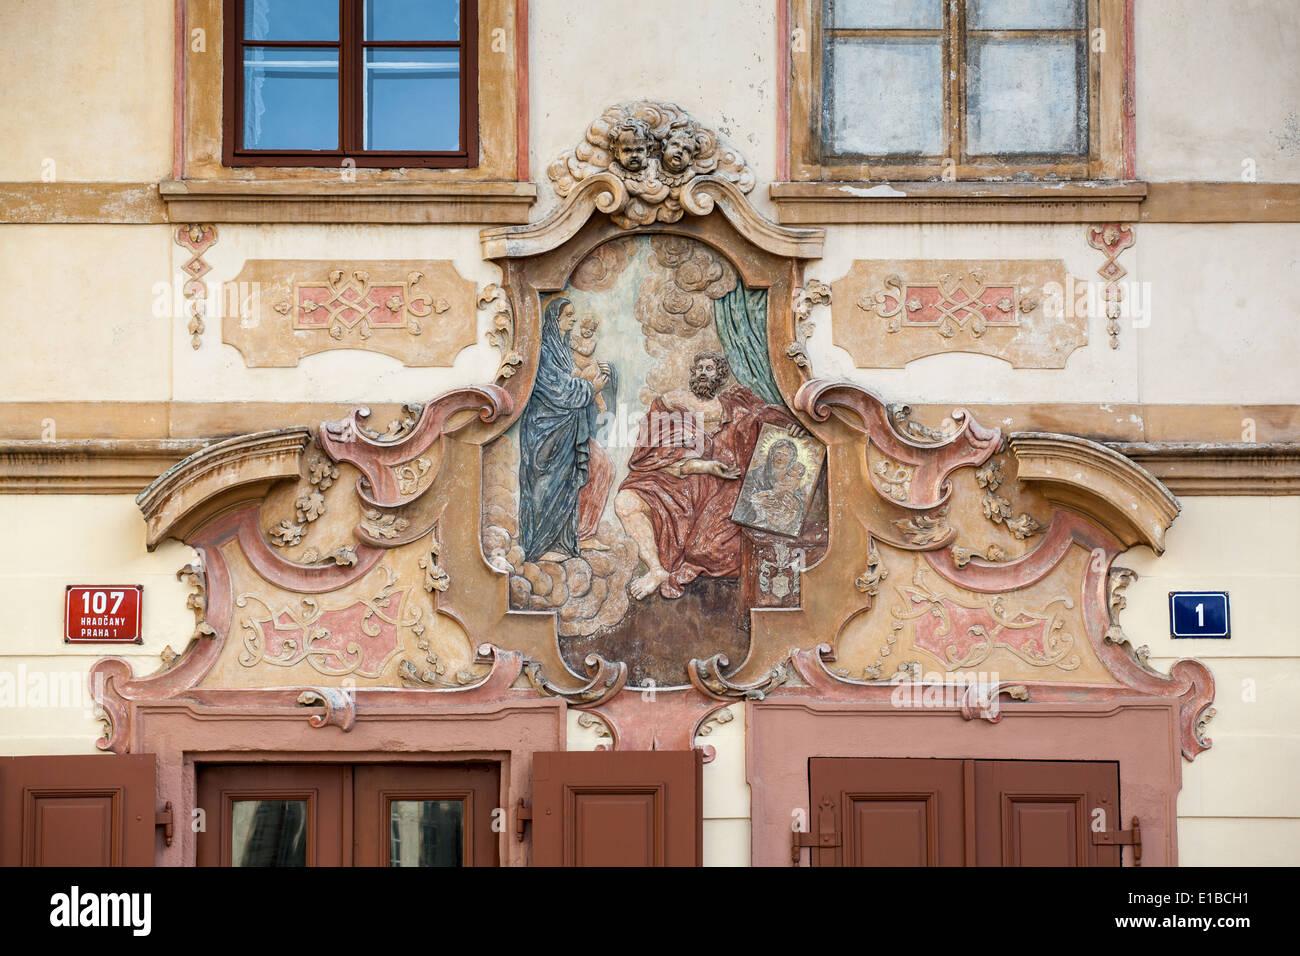 Fresco on wall of U Cerného Vola (The Black Ox) at Loretanska street, Prague, Czech Republic - Stock Image